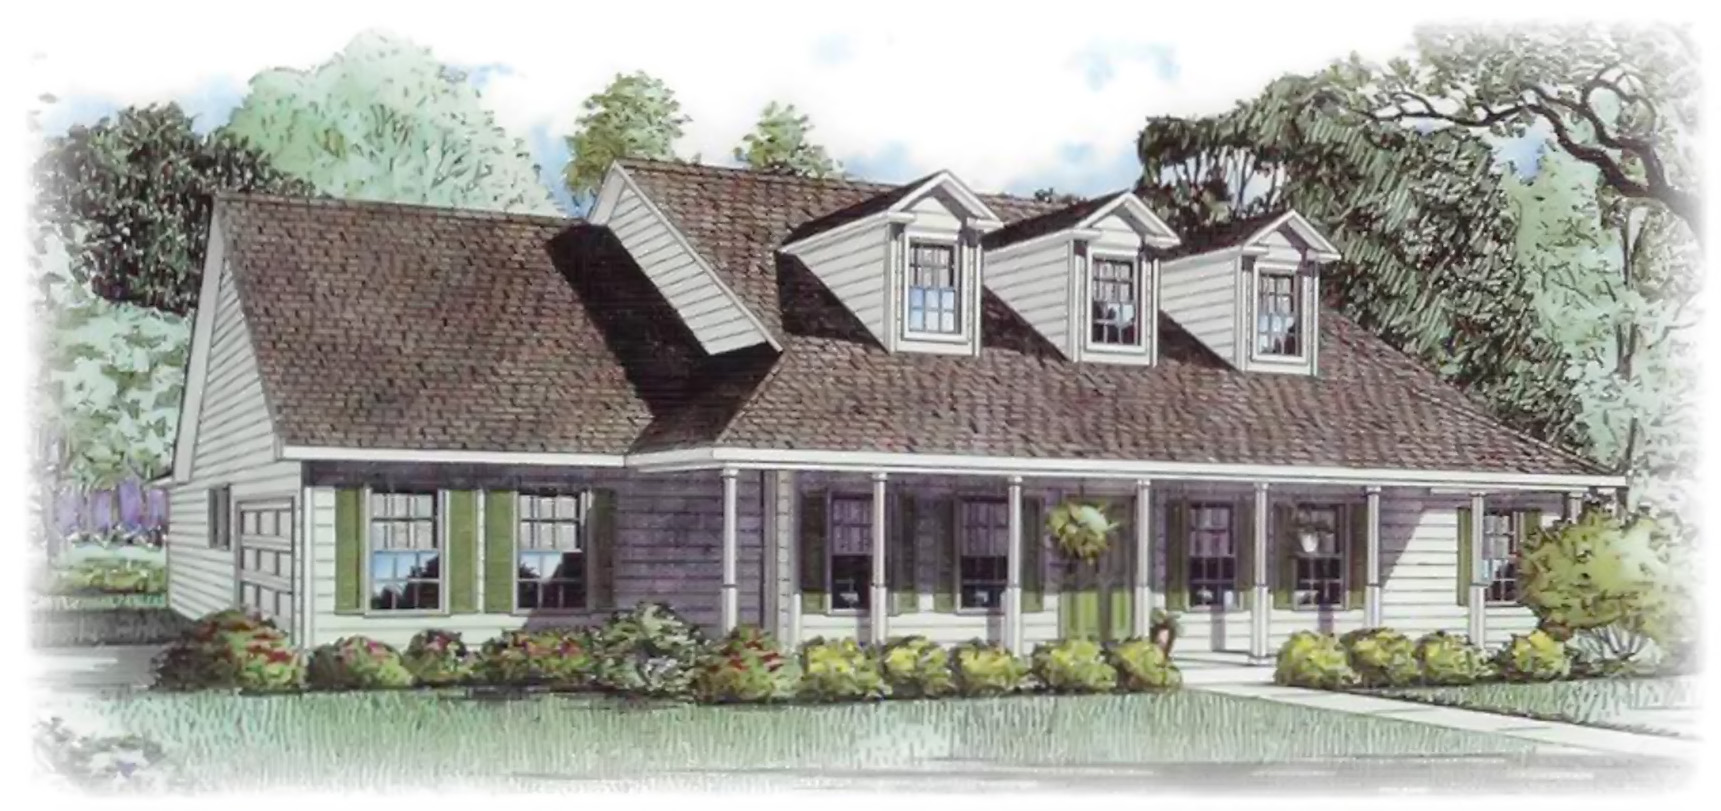 Covington Pennyworth Homes Tallahassee Home Builder